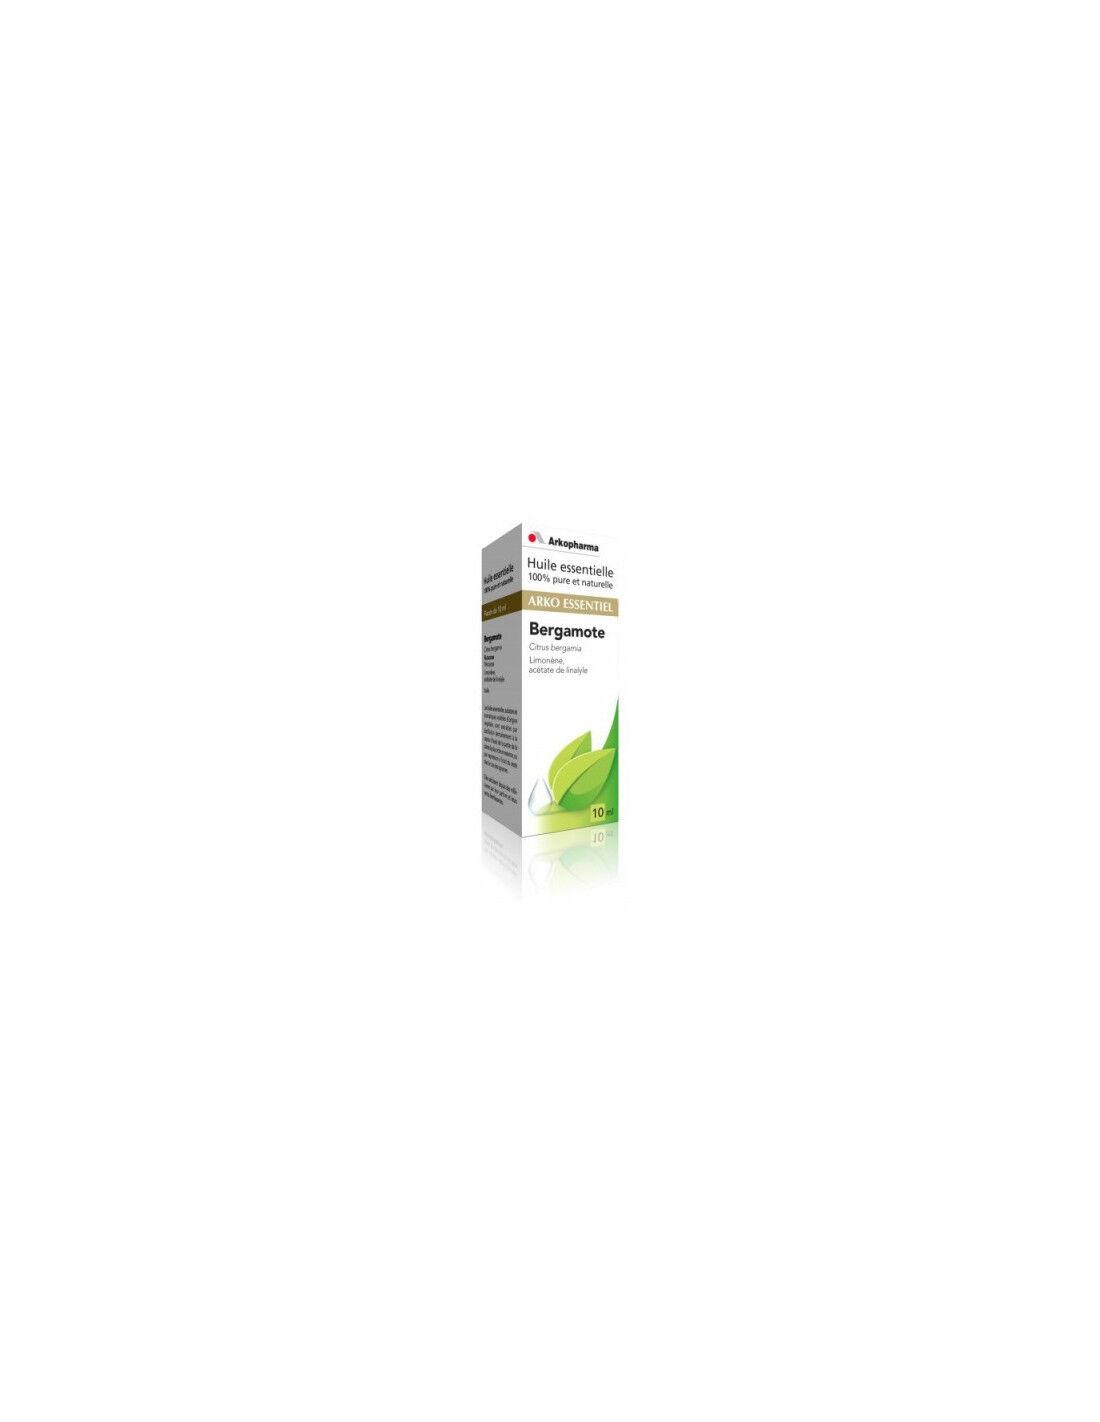 Arkopharma Arko Essentiel huile essentielle de bergamote 10 ml